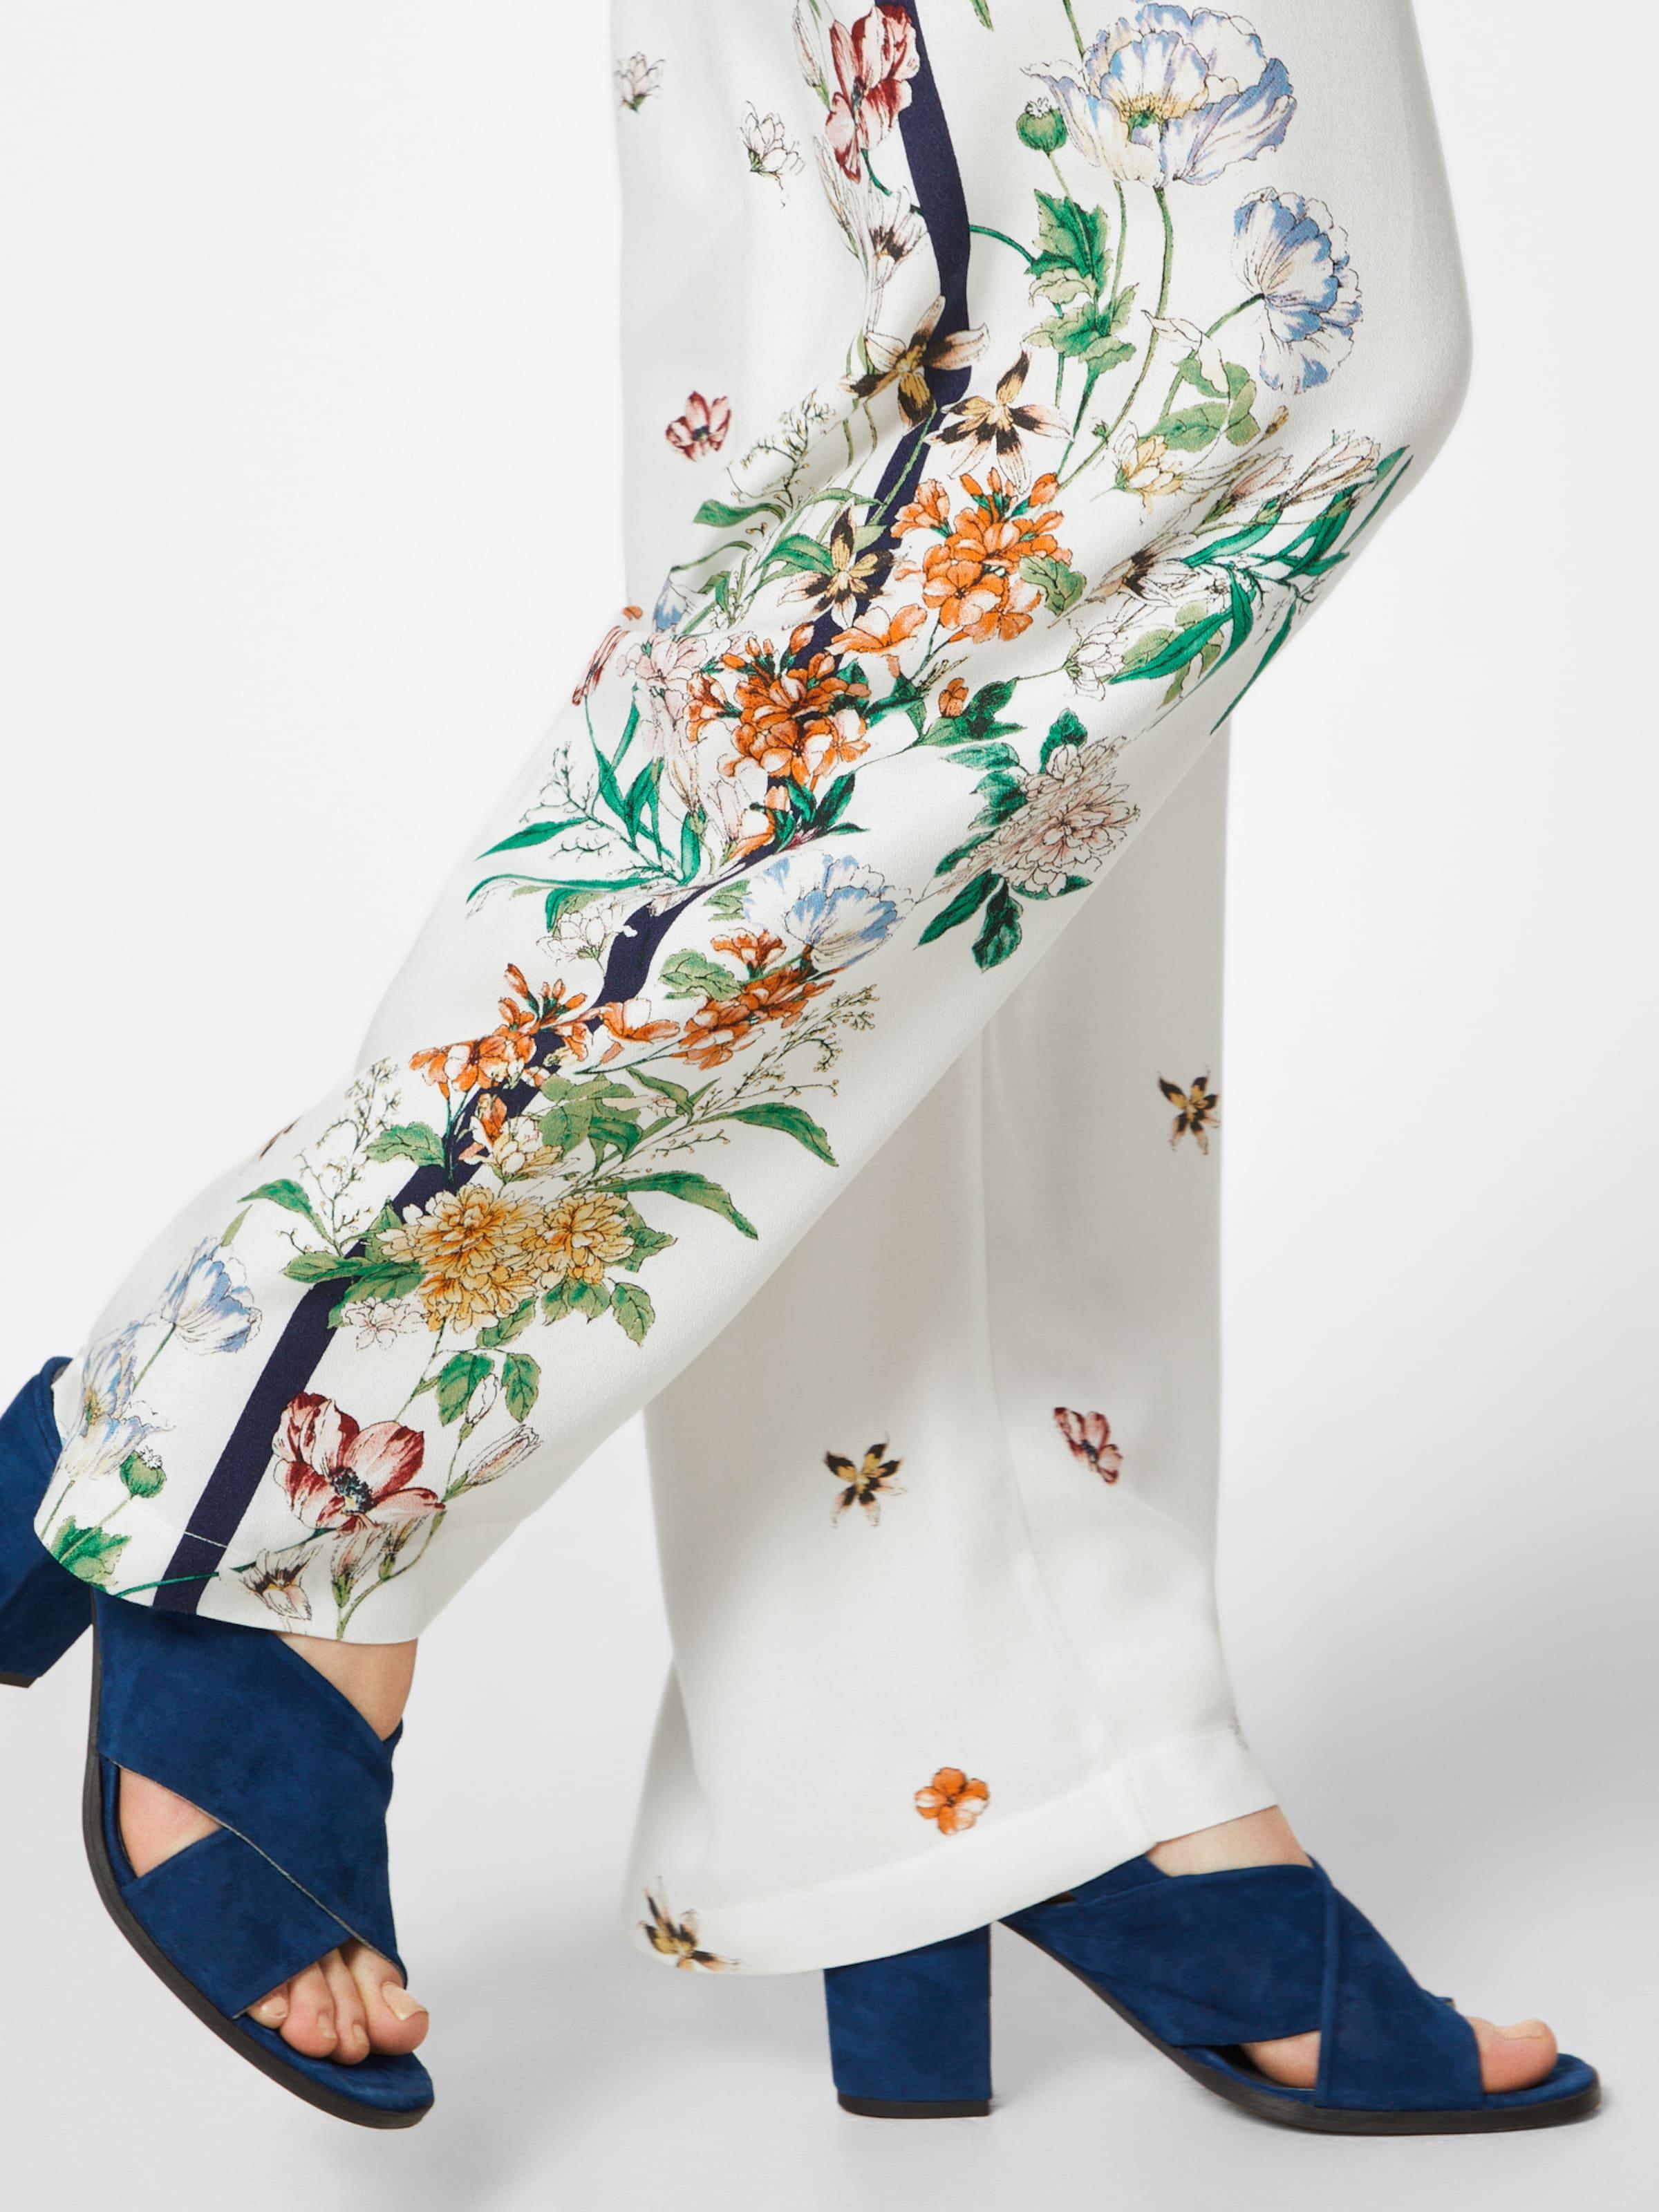 Blanc Collection En Blanc Pantalon En Esprit Esprit Collection Collection Esprit Pantalon Pantalon En shrdtCxBoQ